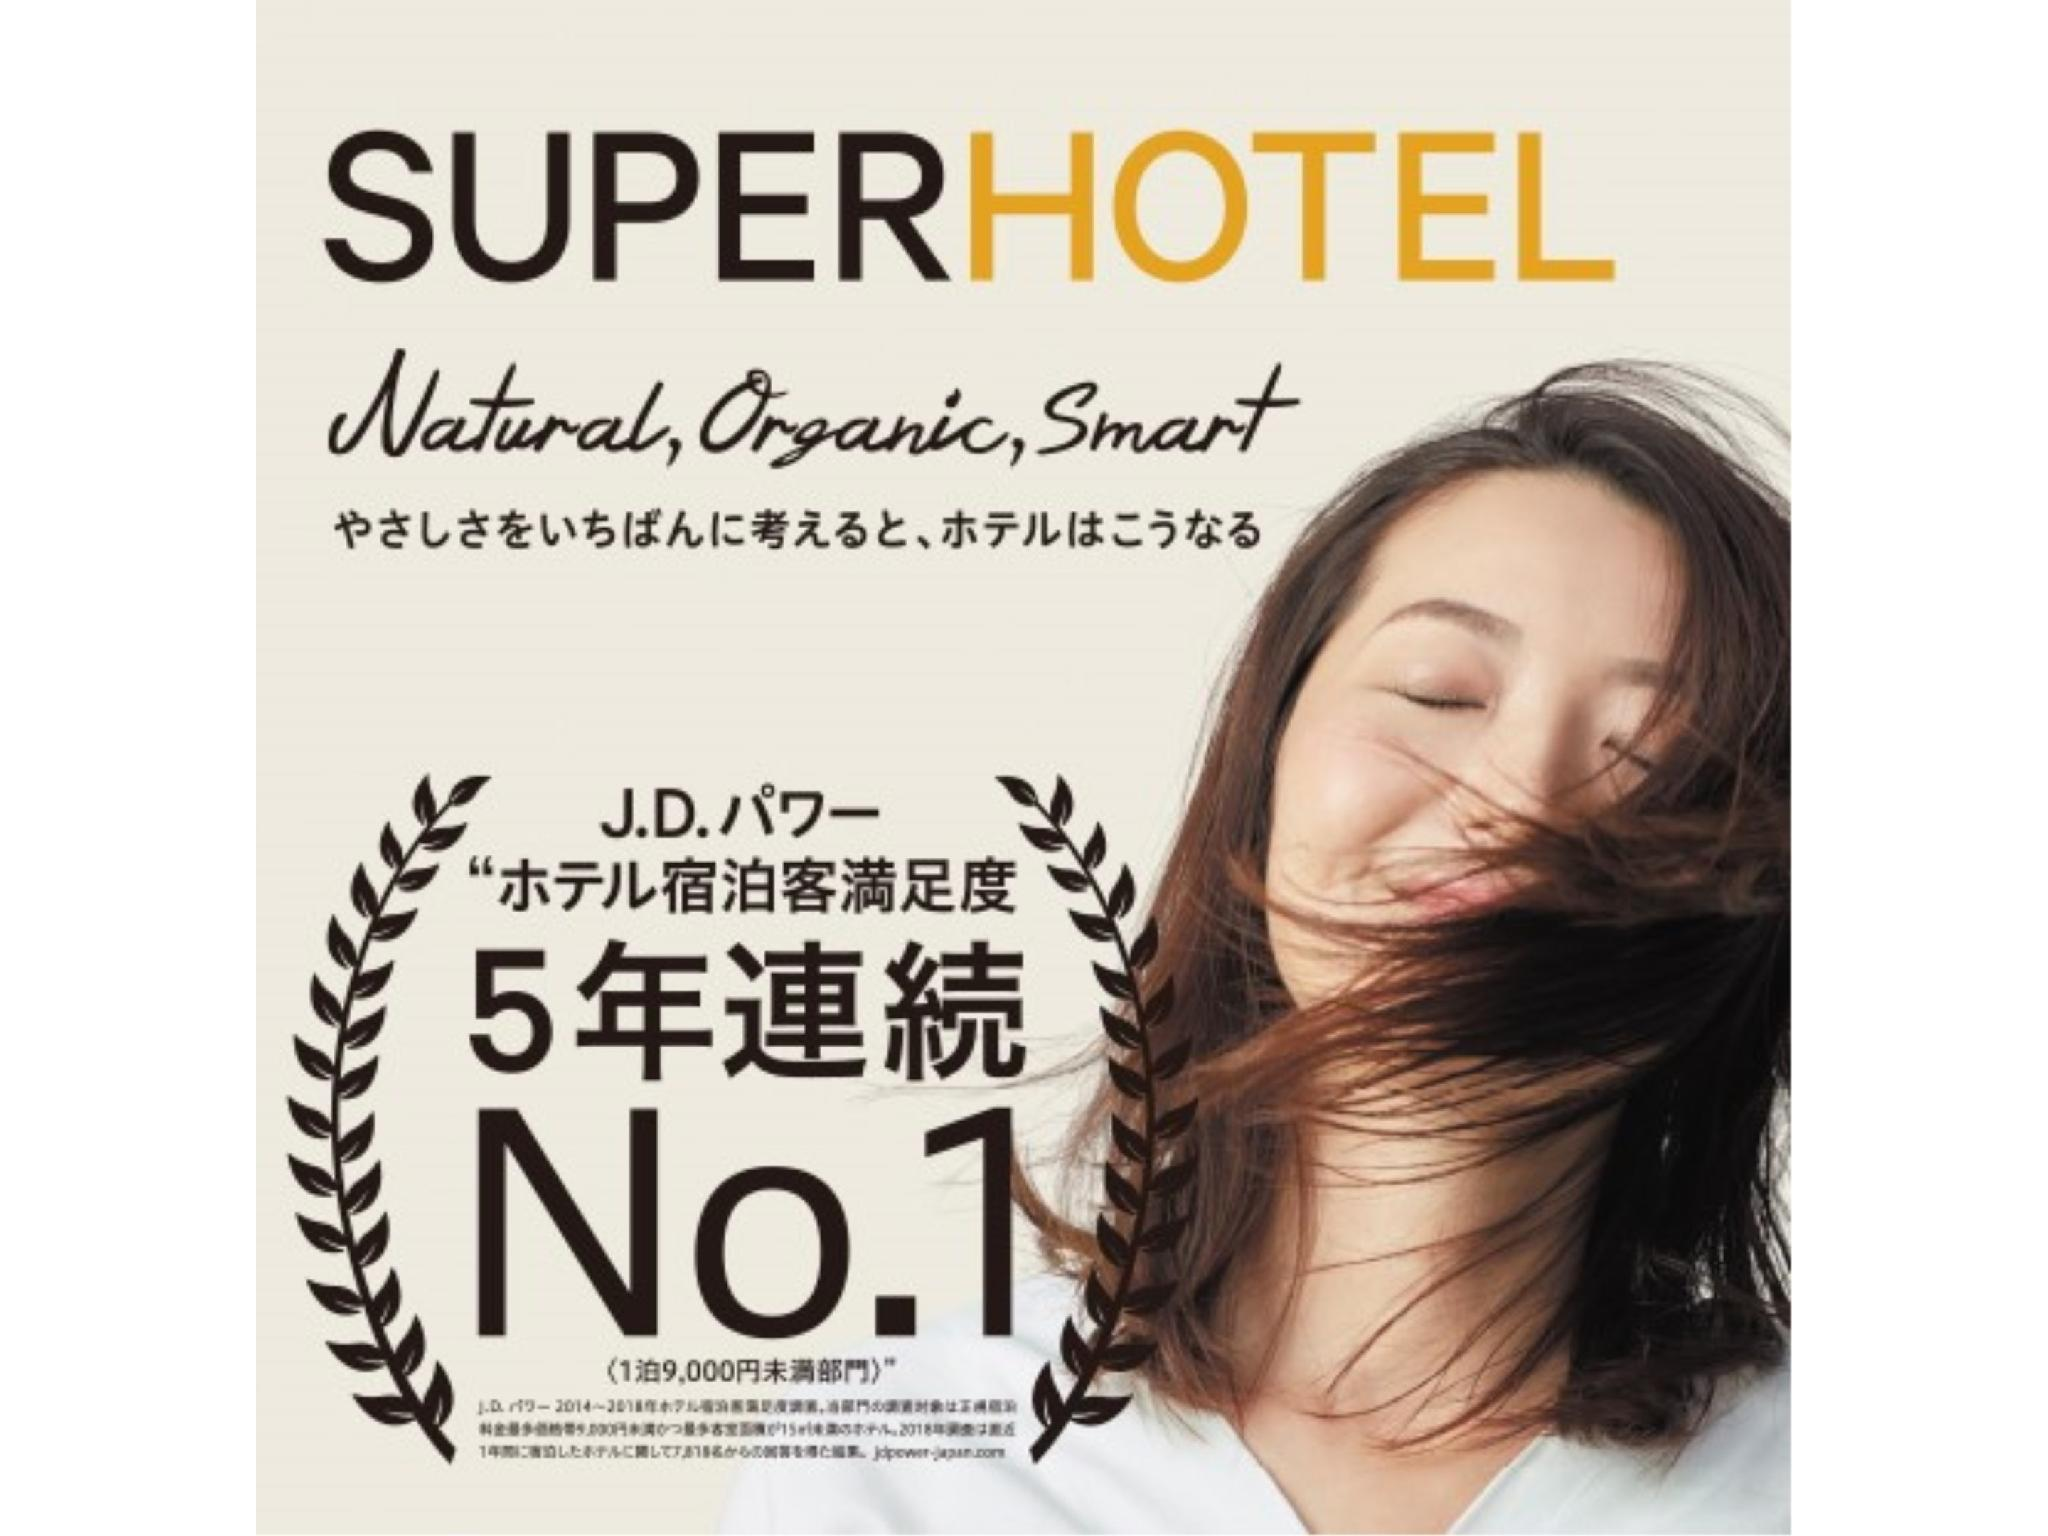 Super Hotel Saitama Kuki